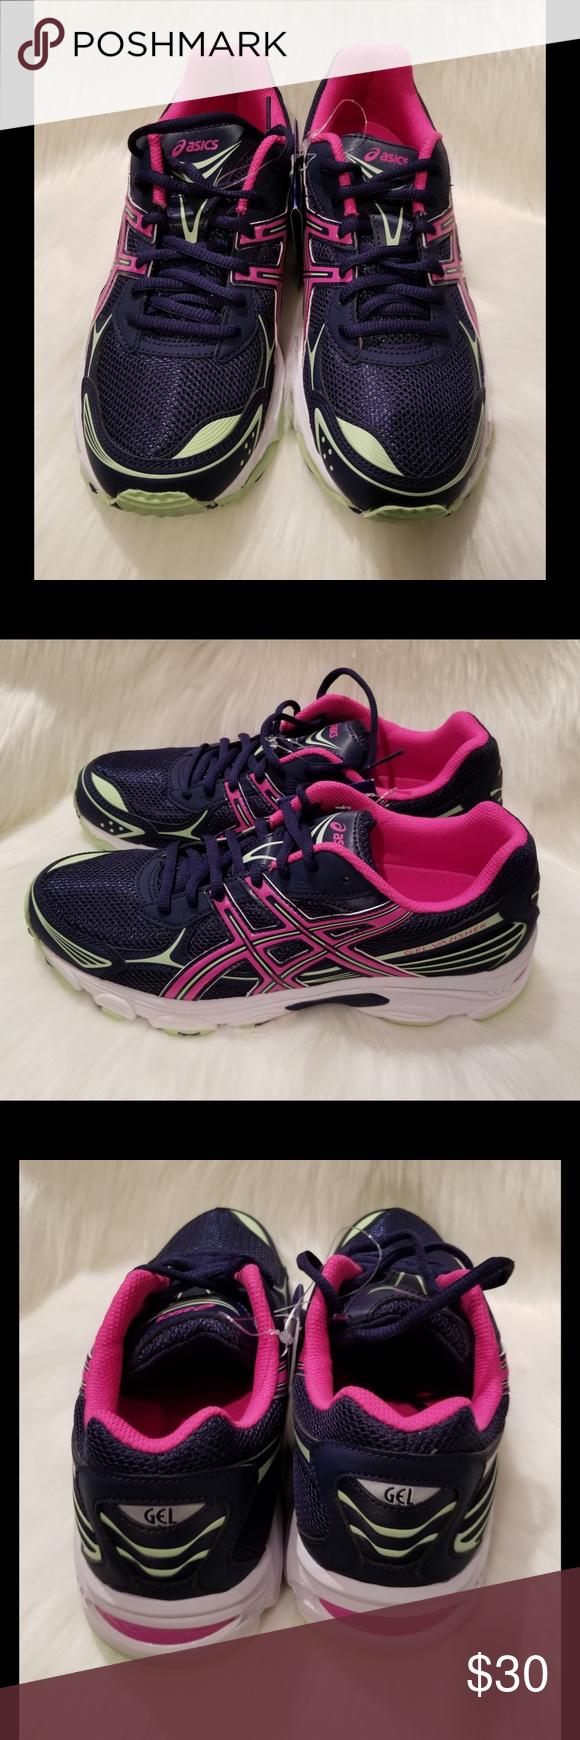 Womens running shoes, Running shoe